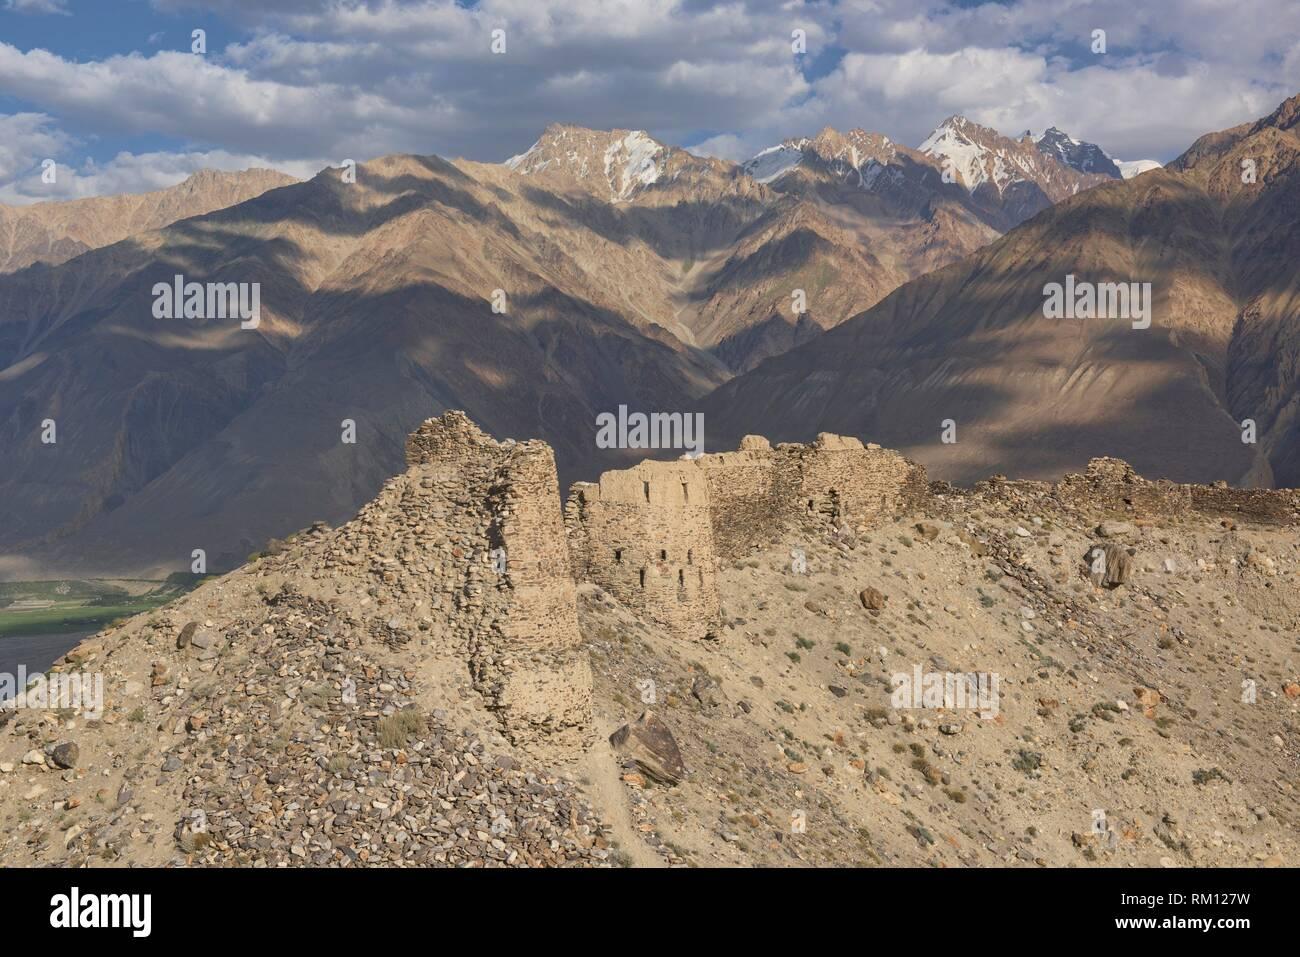 The Yamchun Fort ruins rise over the Wakhan Valley and Afghanistan Hindu Kush, Vikchut, Tajikistan. - Stock Image